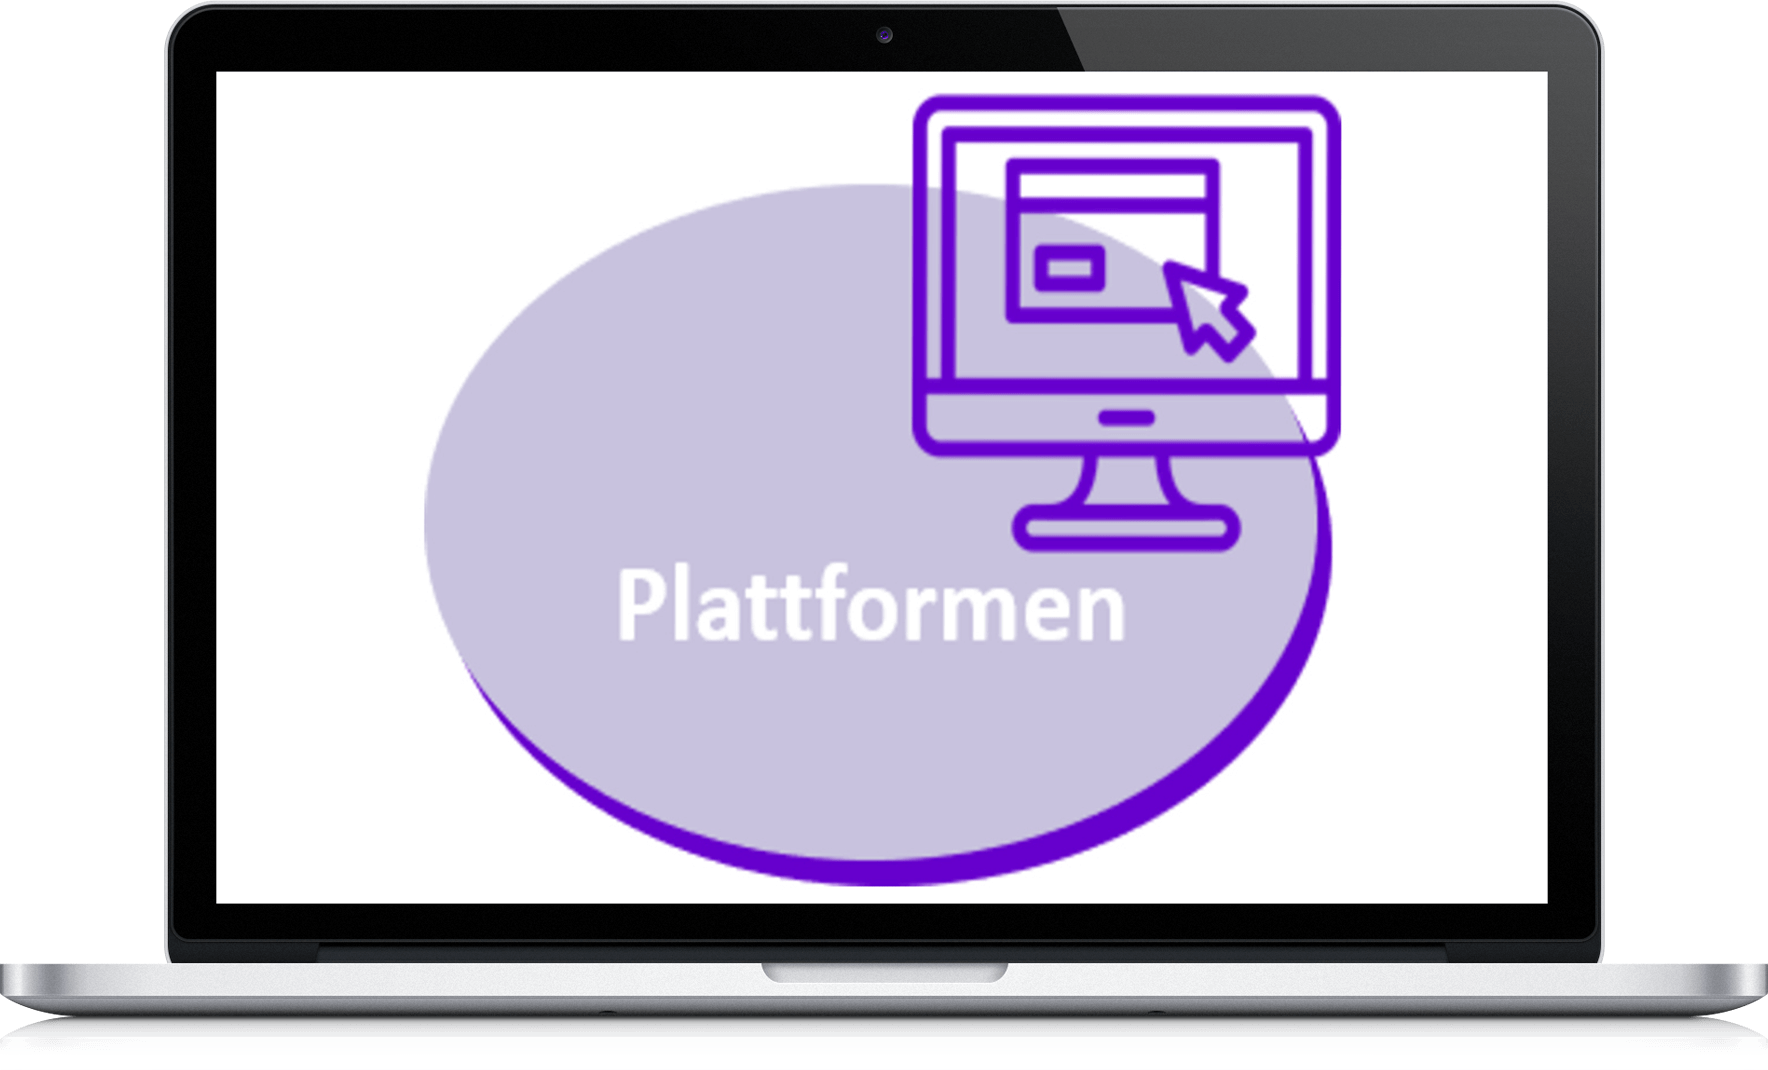 Plattformen 3D